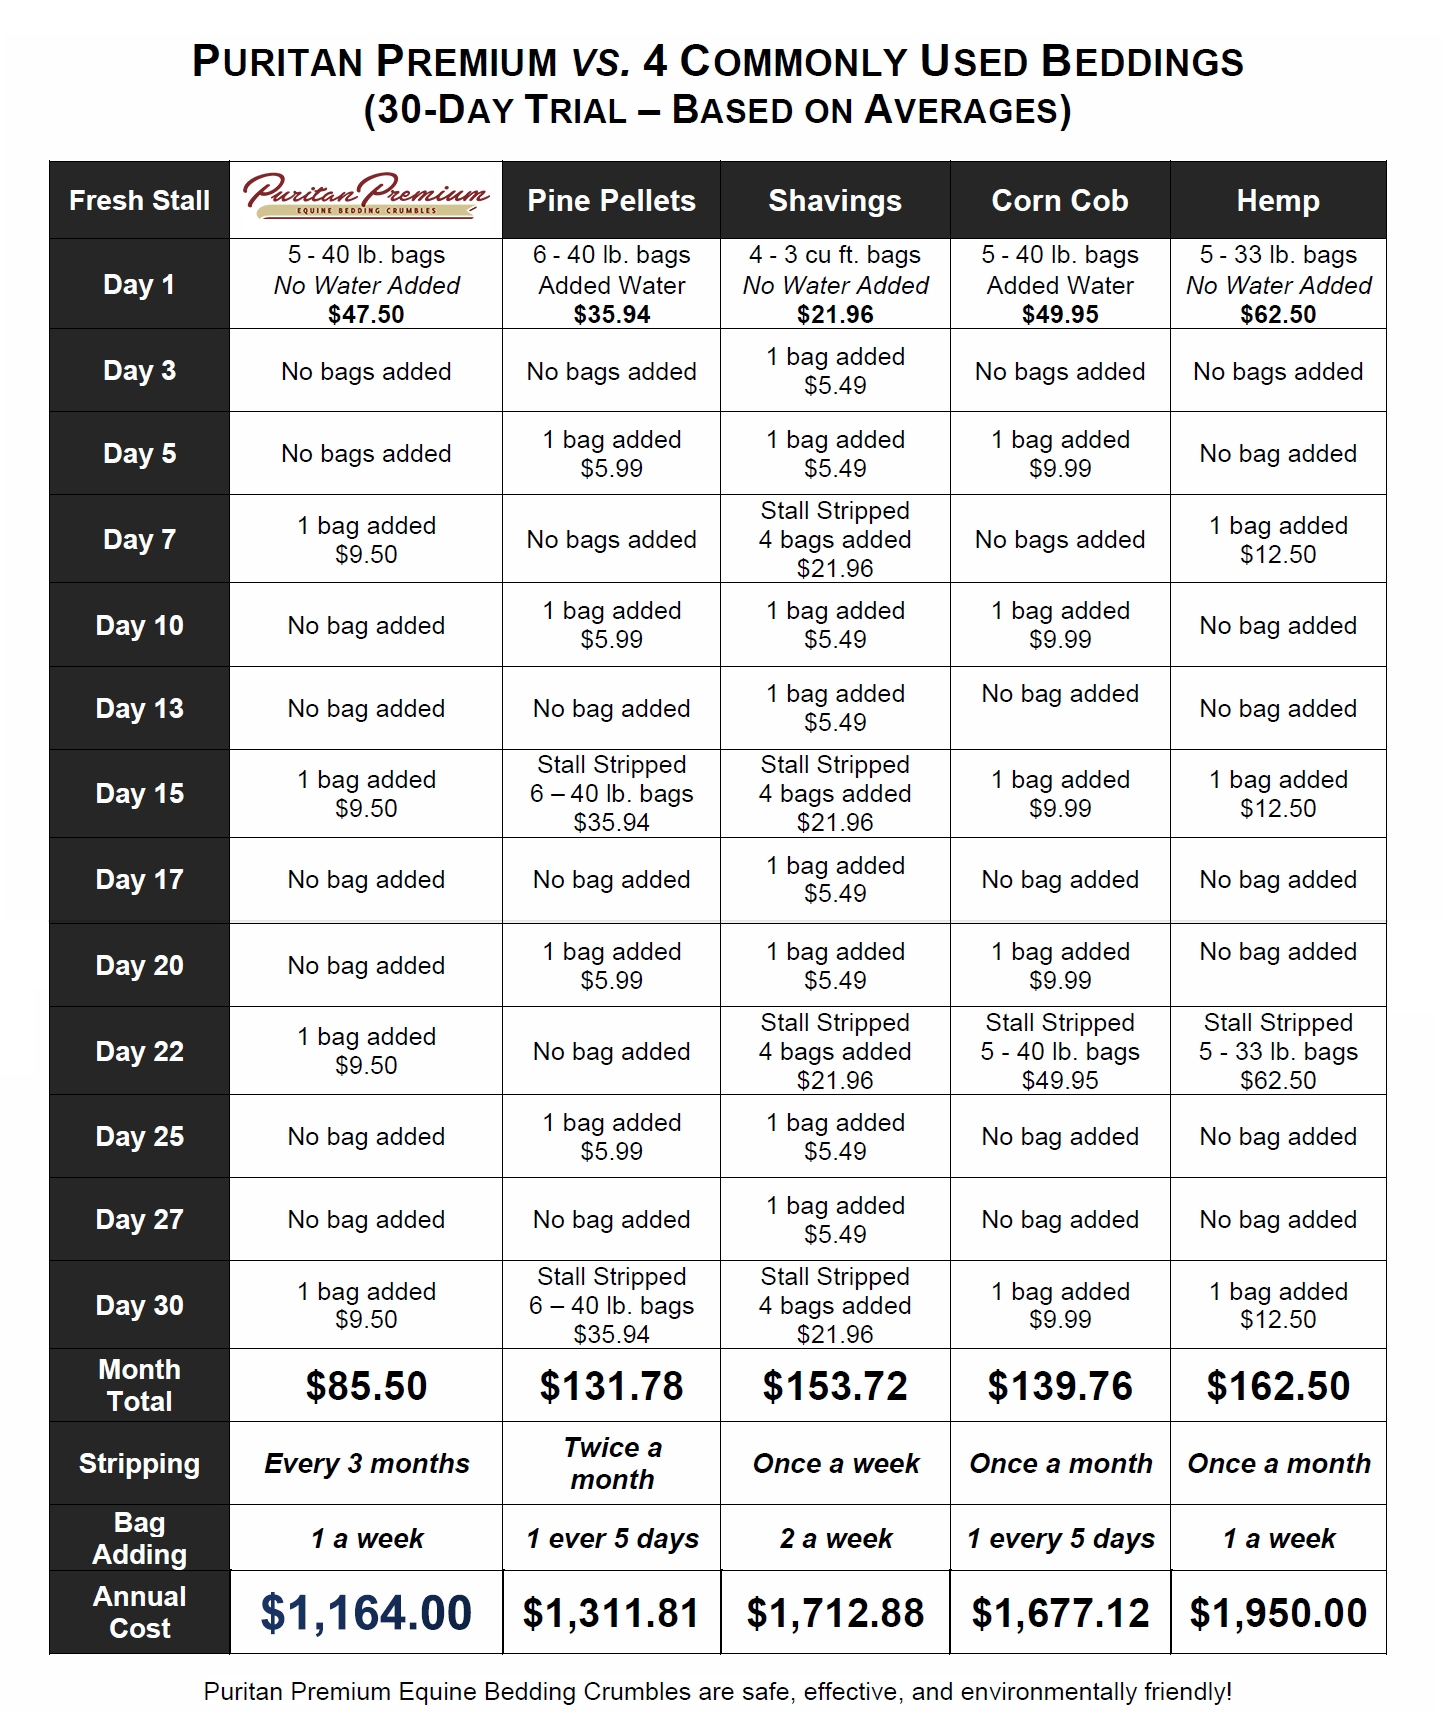 Puritan Premium vs Other Bedding - Price Comparison FEB2018.jpg